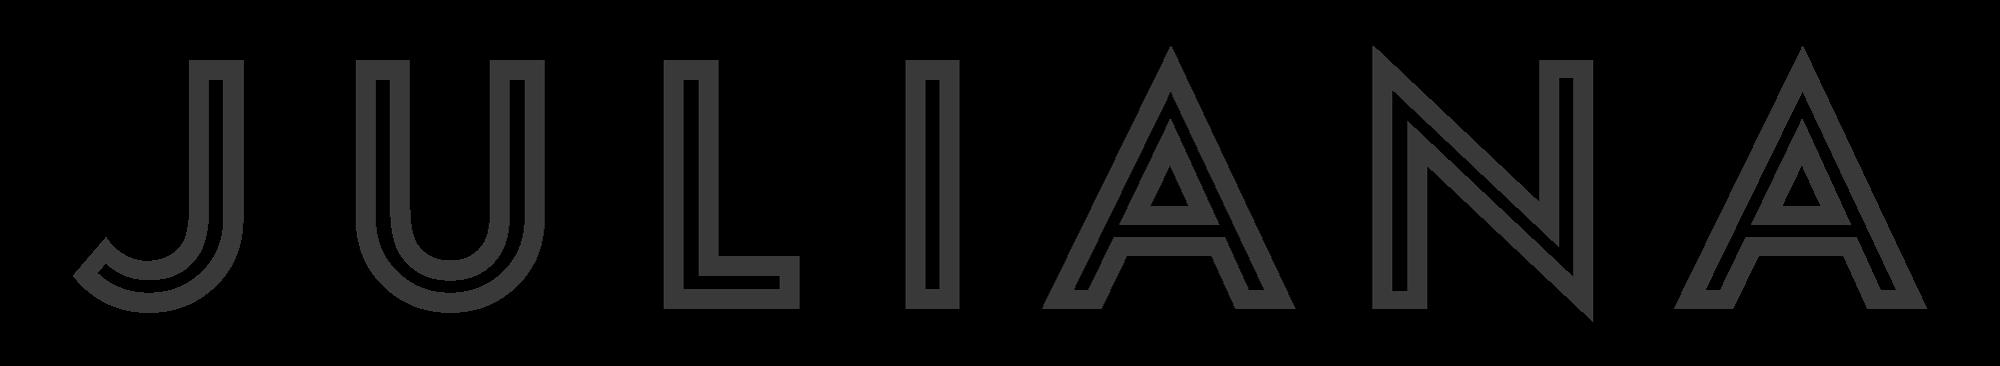 Juliana_Logo_Wordmark_Dark.png